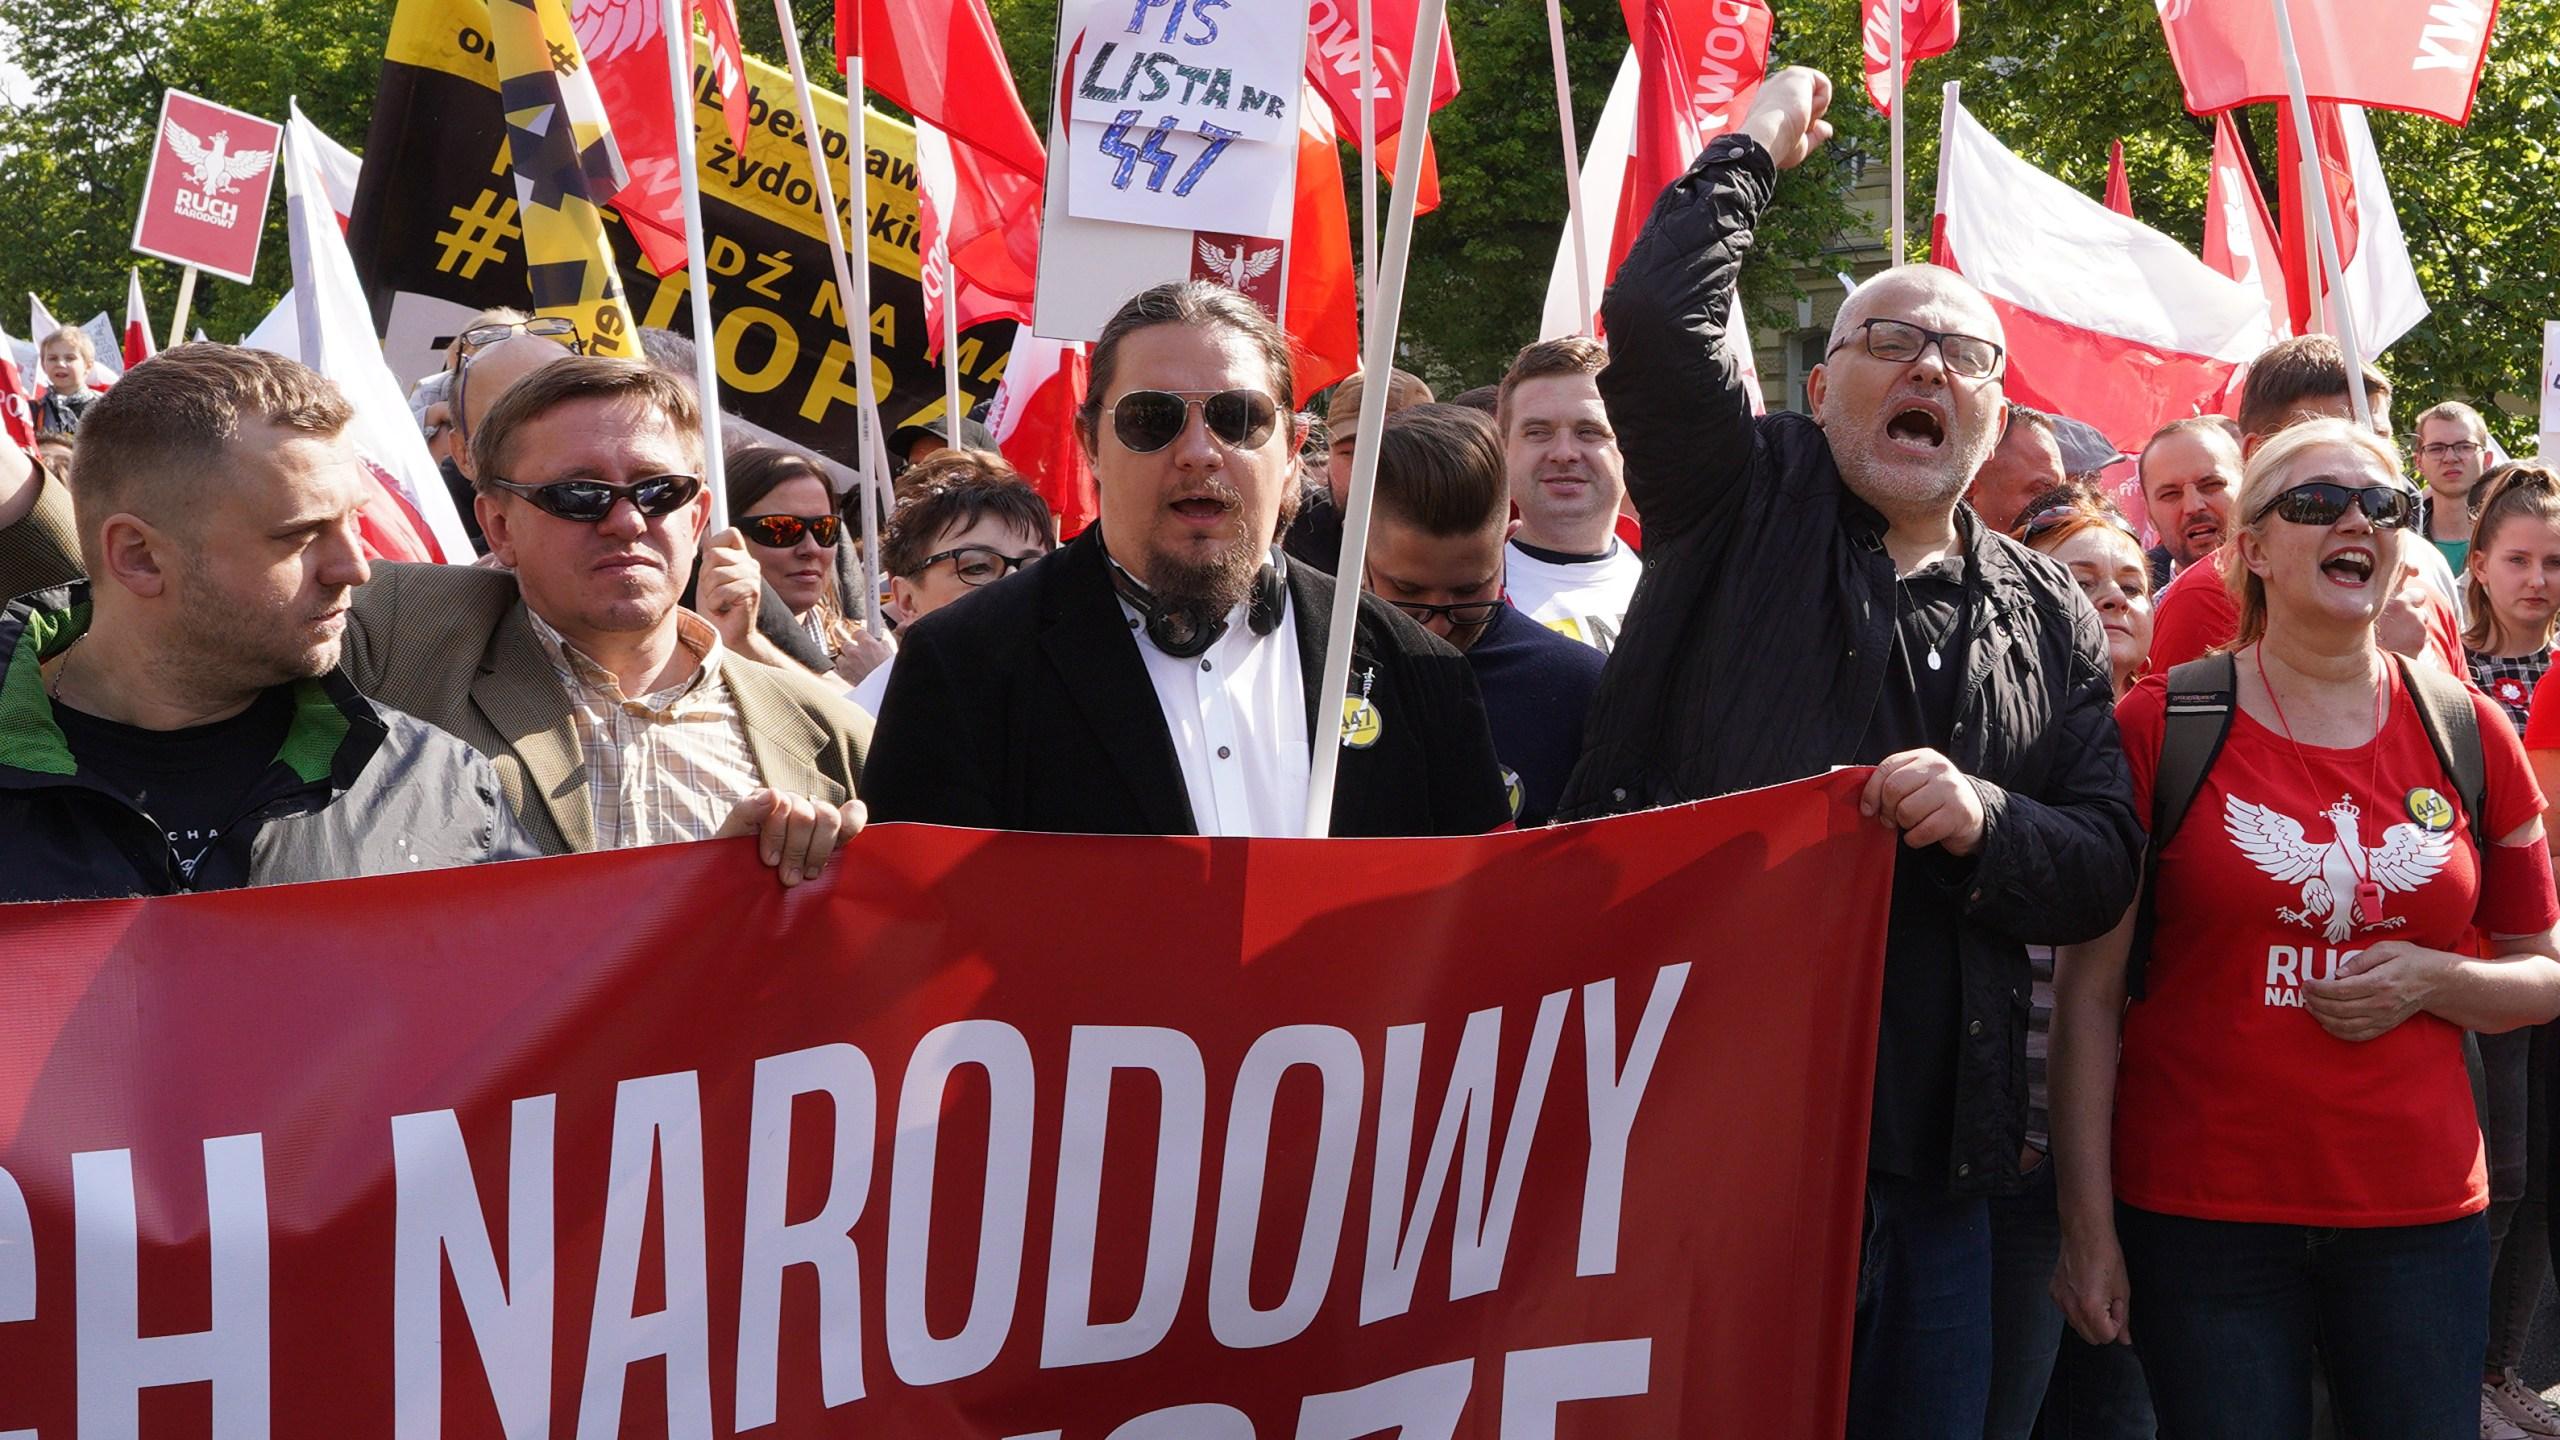 Demonstrators protest U.S. Senate's 447 bill, in Warsaw on May 11, 2019. (Credit: ALIK KEPLICZ/AFP/Getty Images)